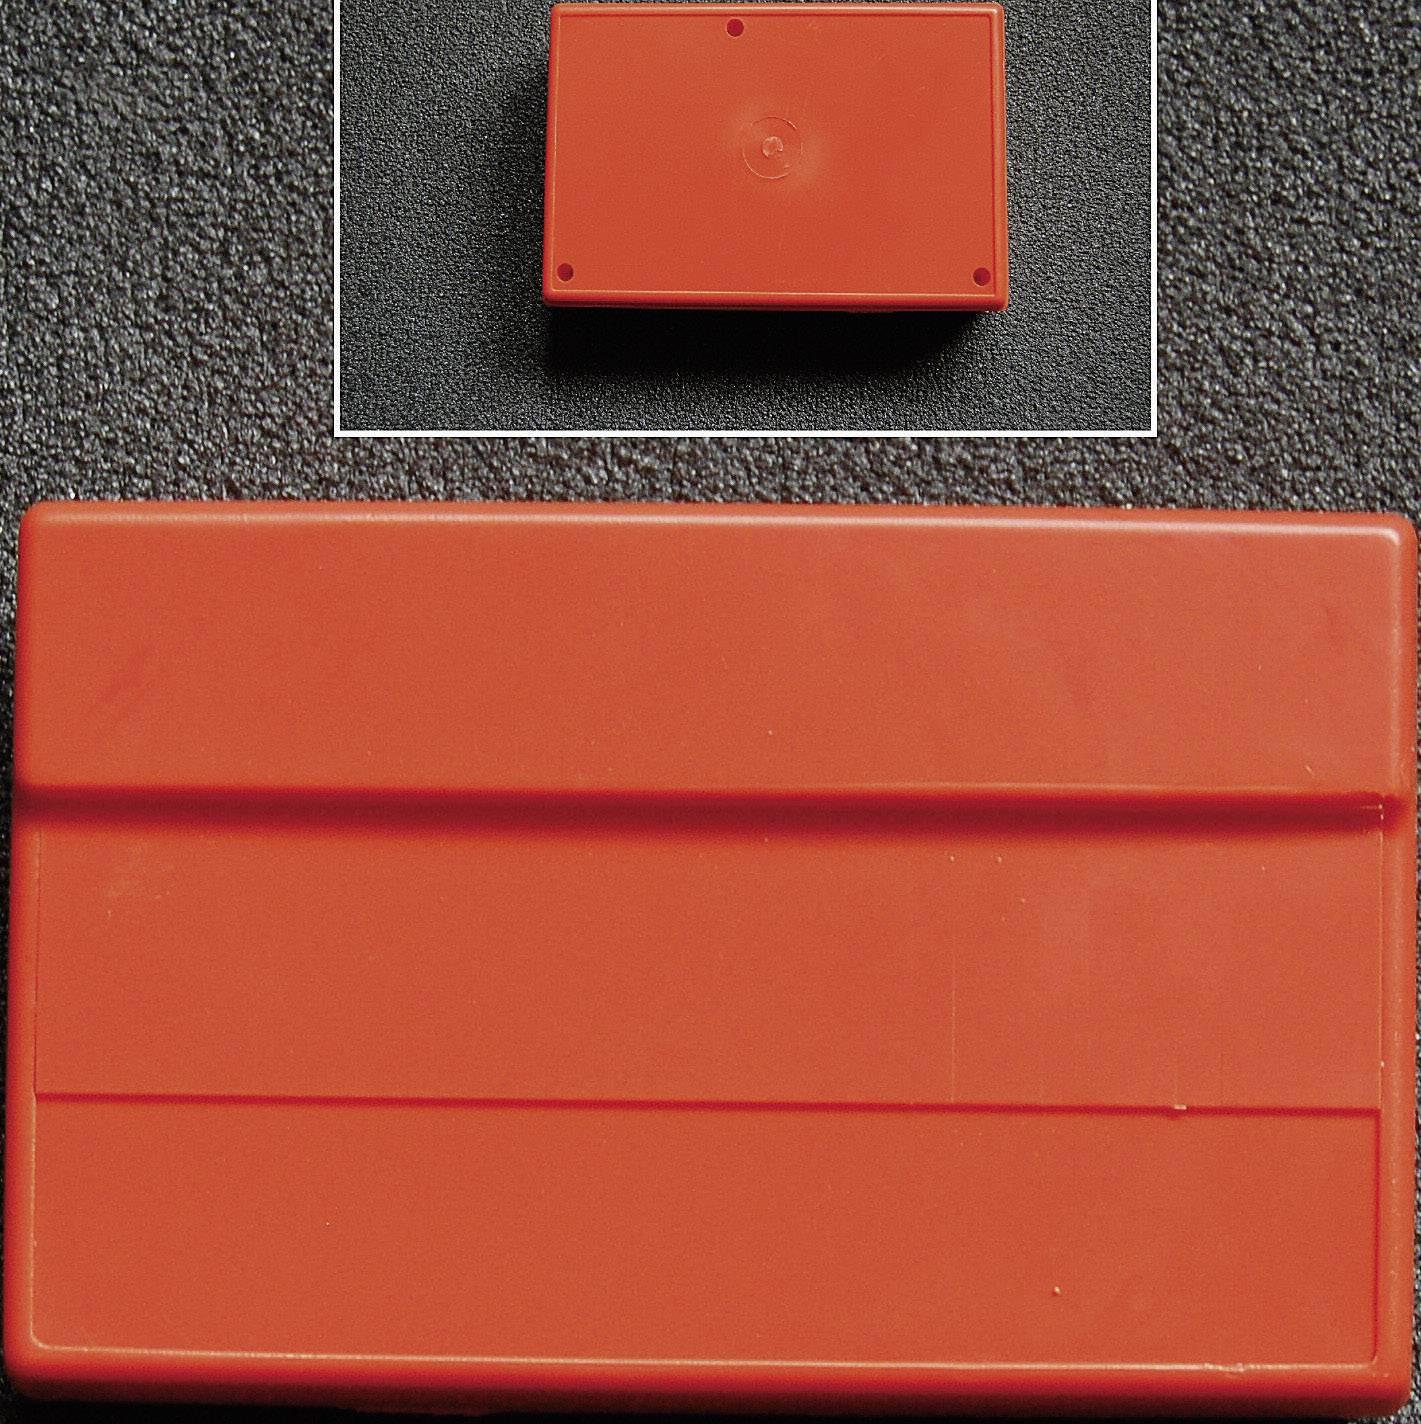 Pultové pouzdro ABS WeroPlast 3005, (d x š x v) 162 x 104 x 50 mm, černá